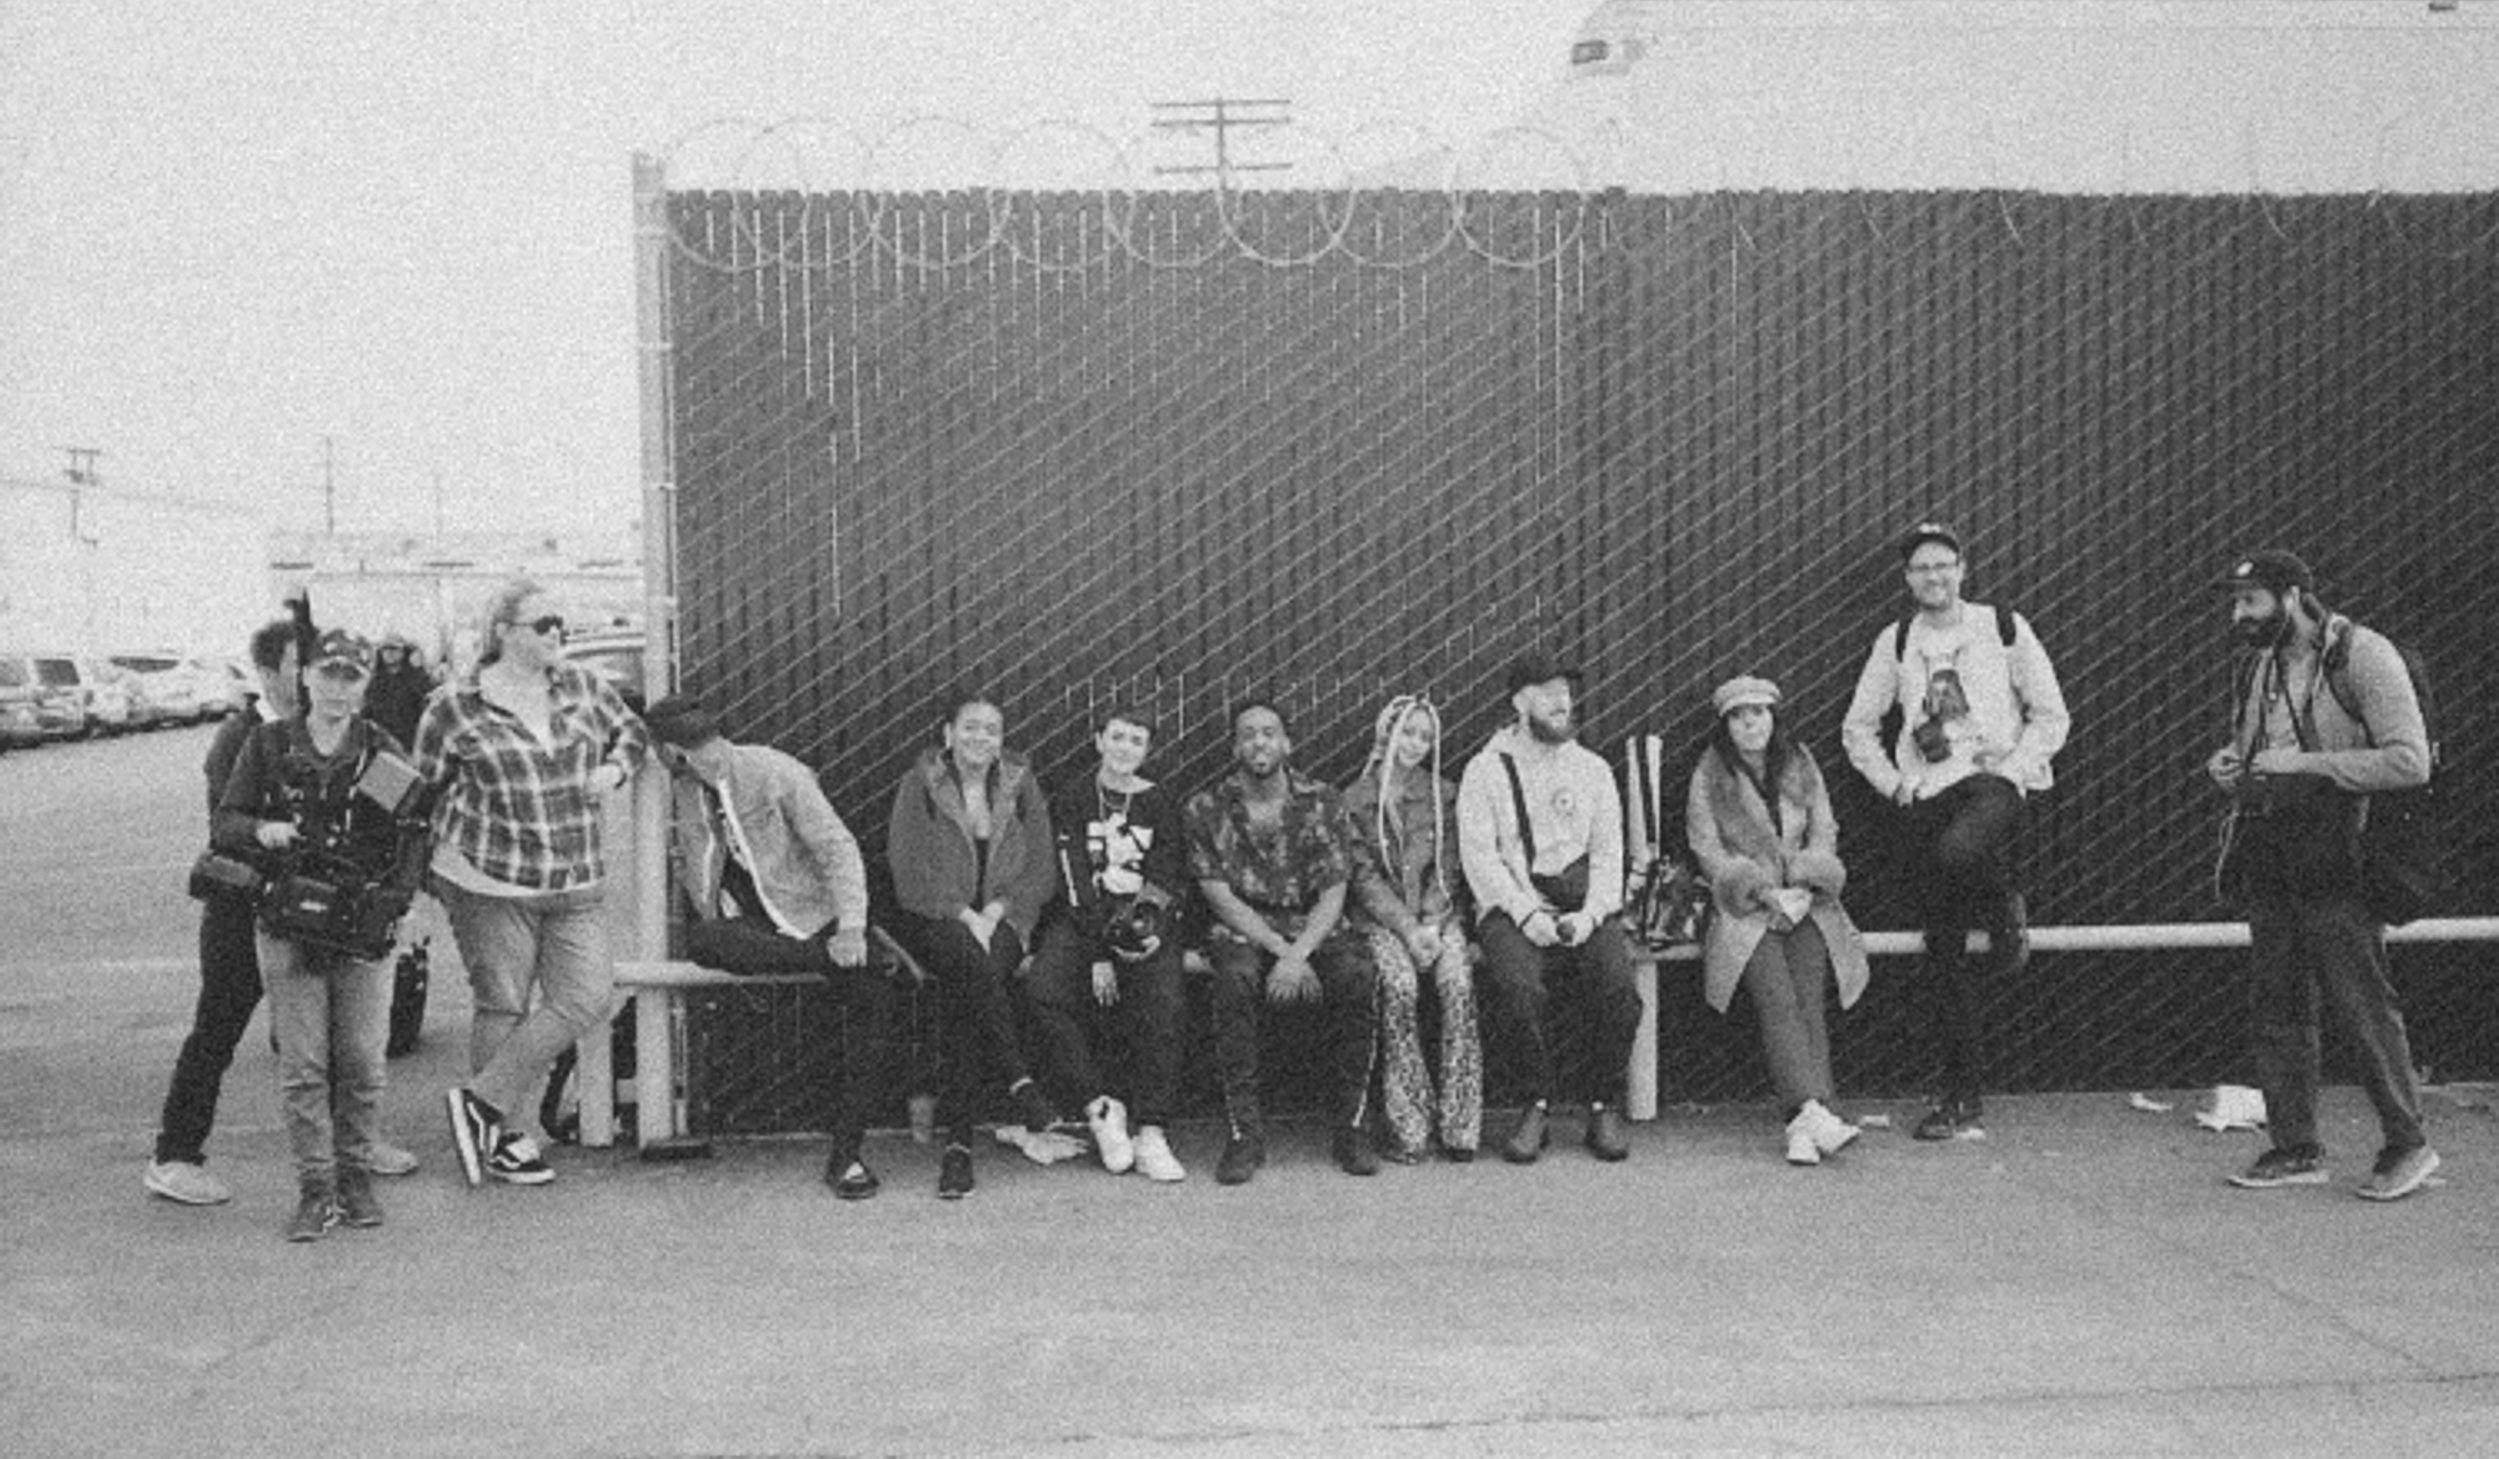 film-archive-kc.locke-82-10.jpg